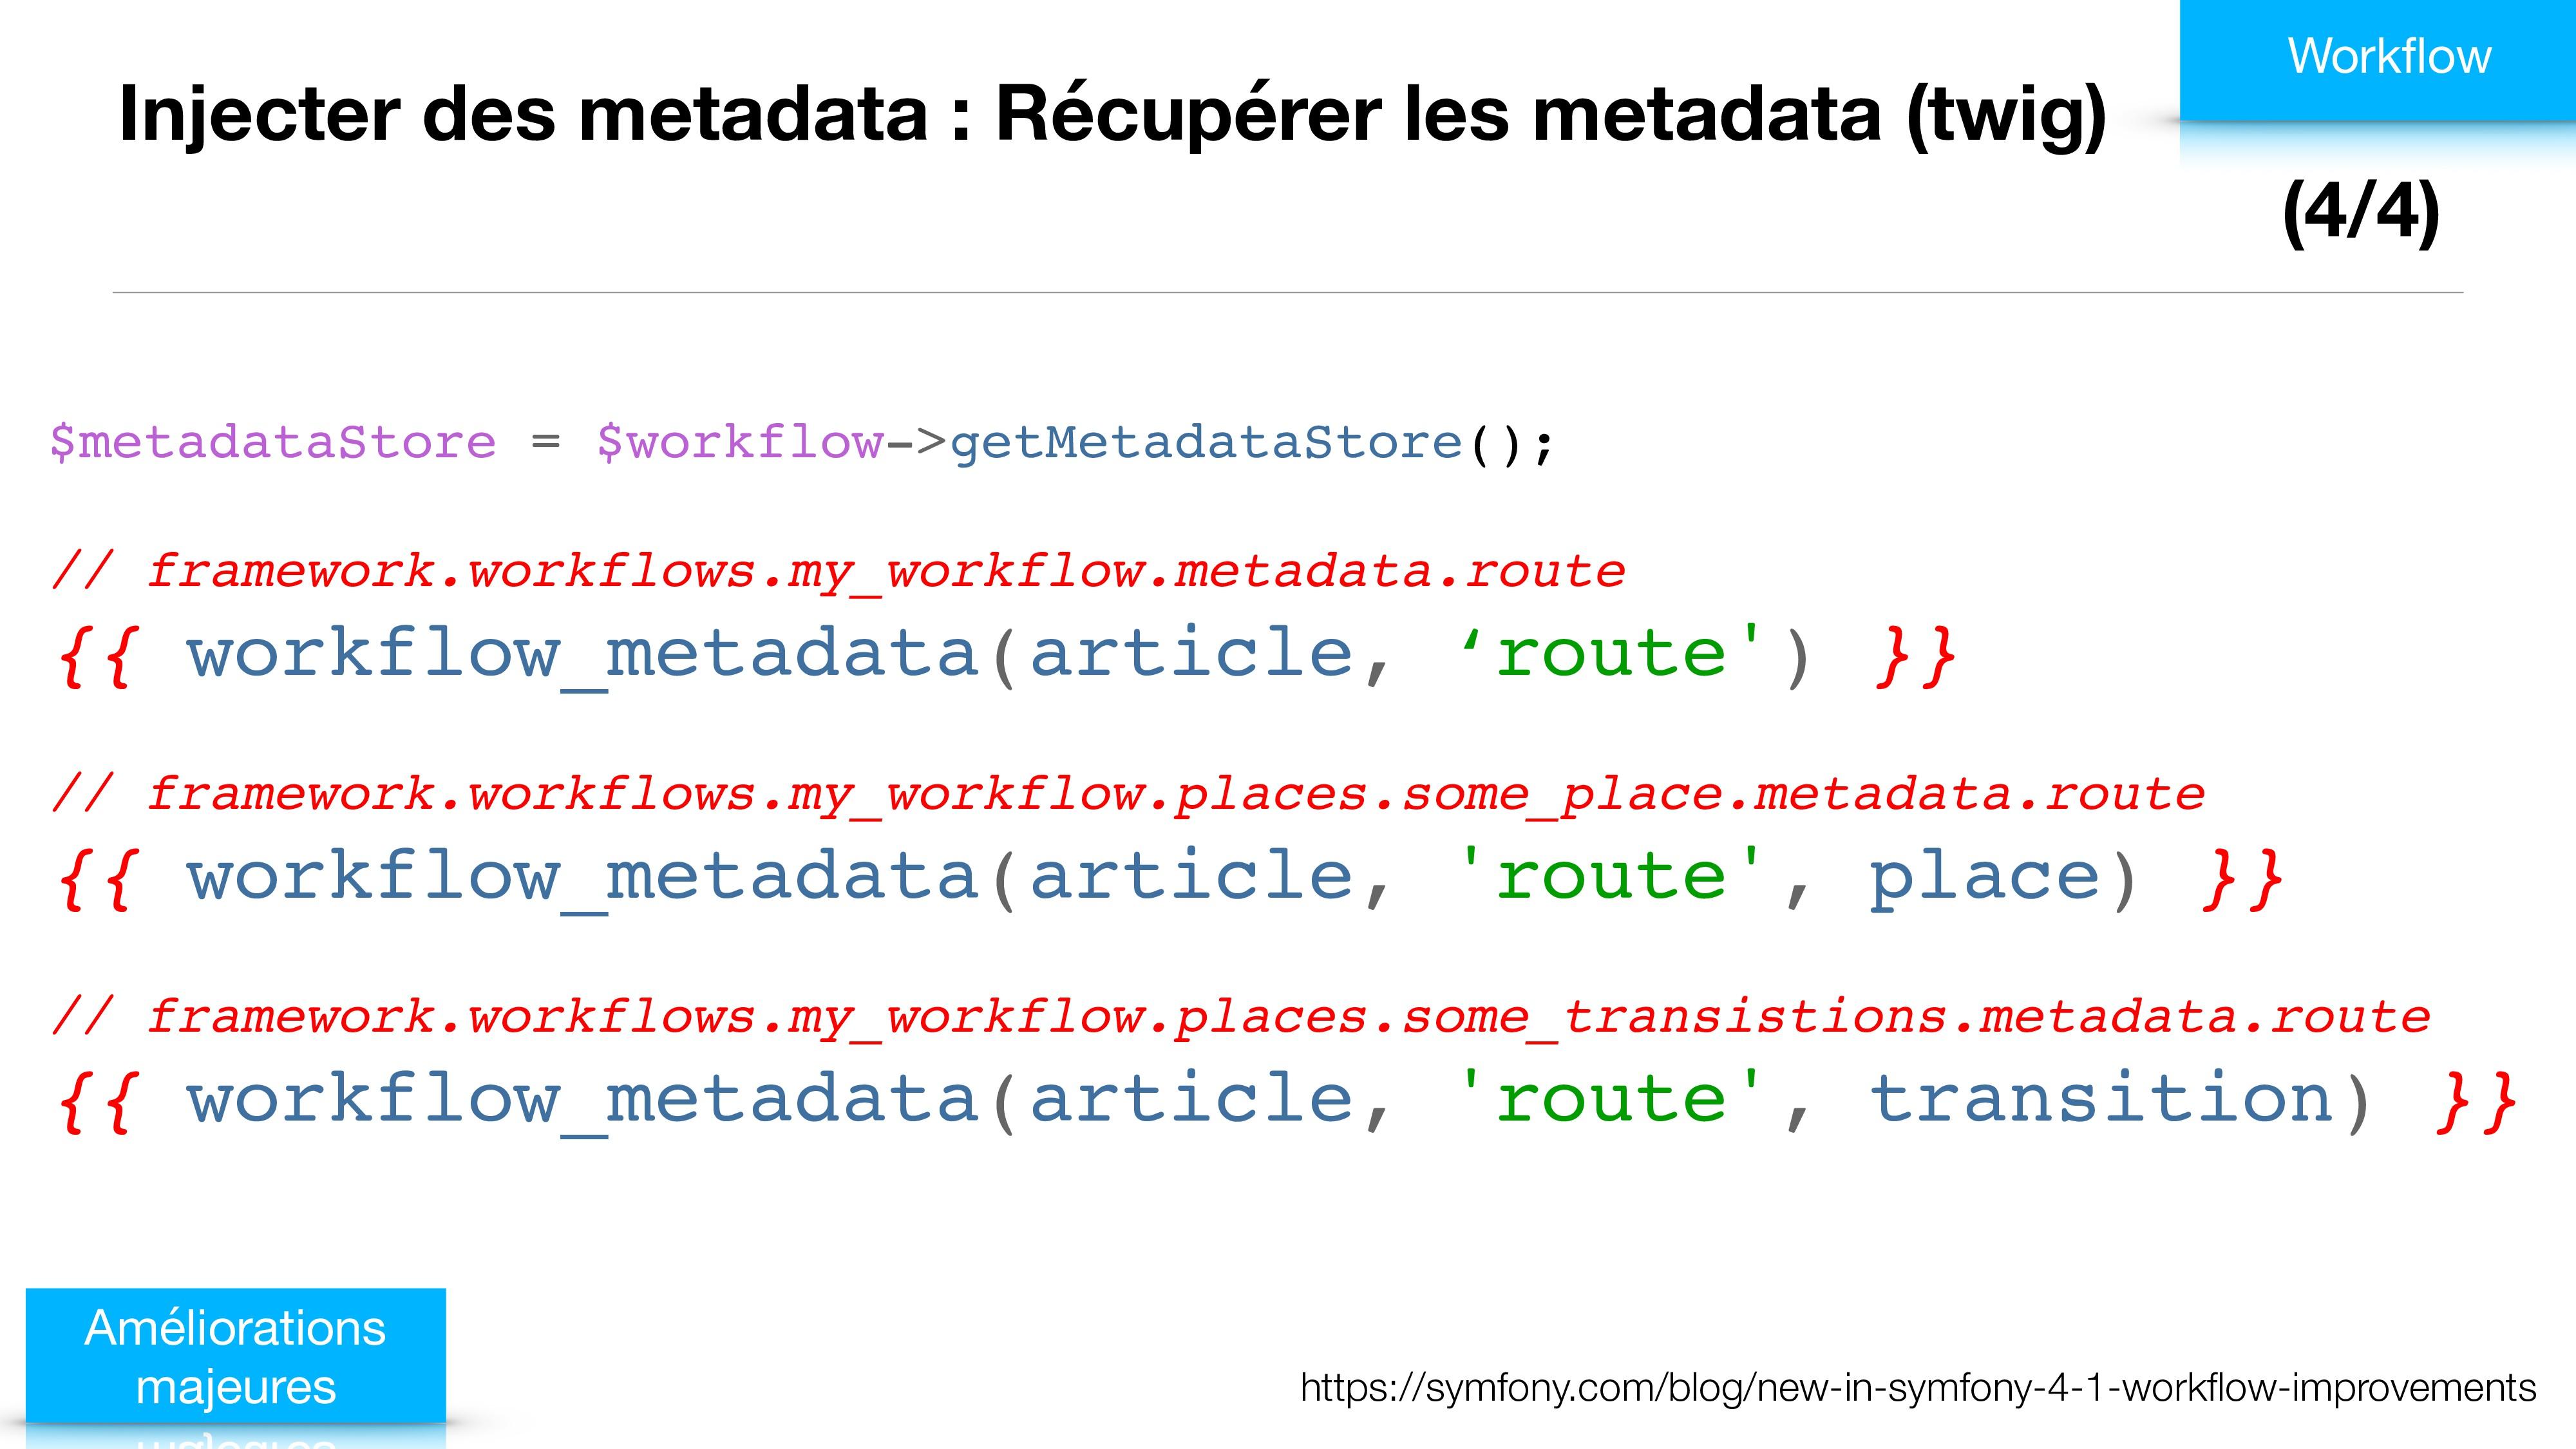 Injecter des metadata : Récupérer les metadata ...